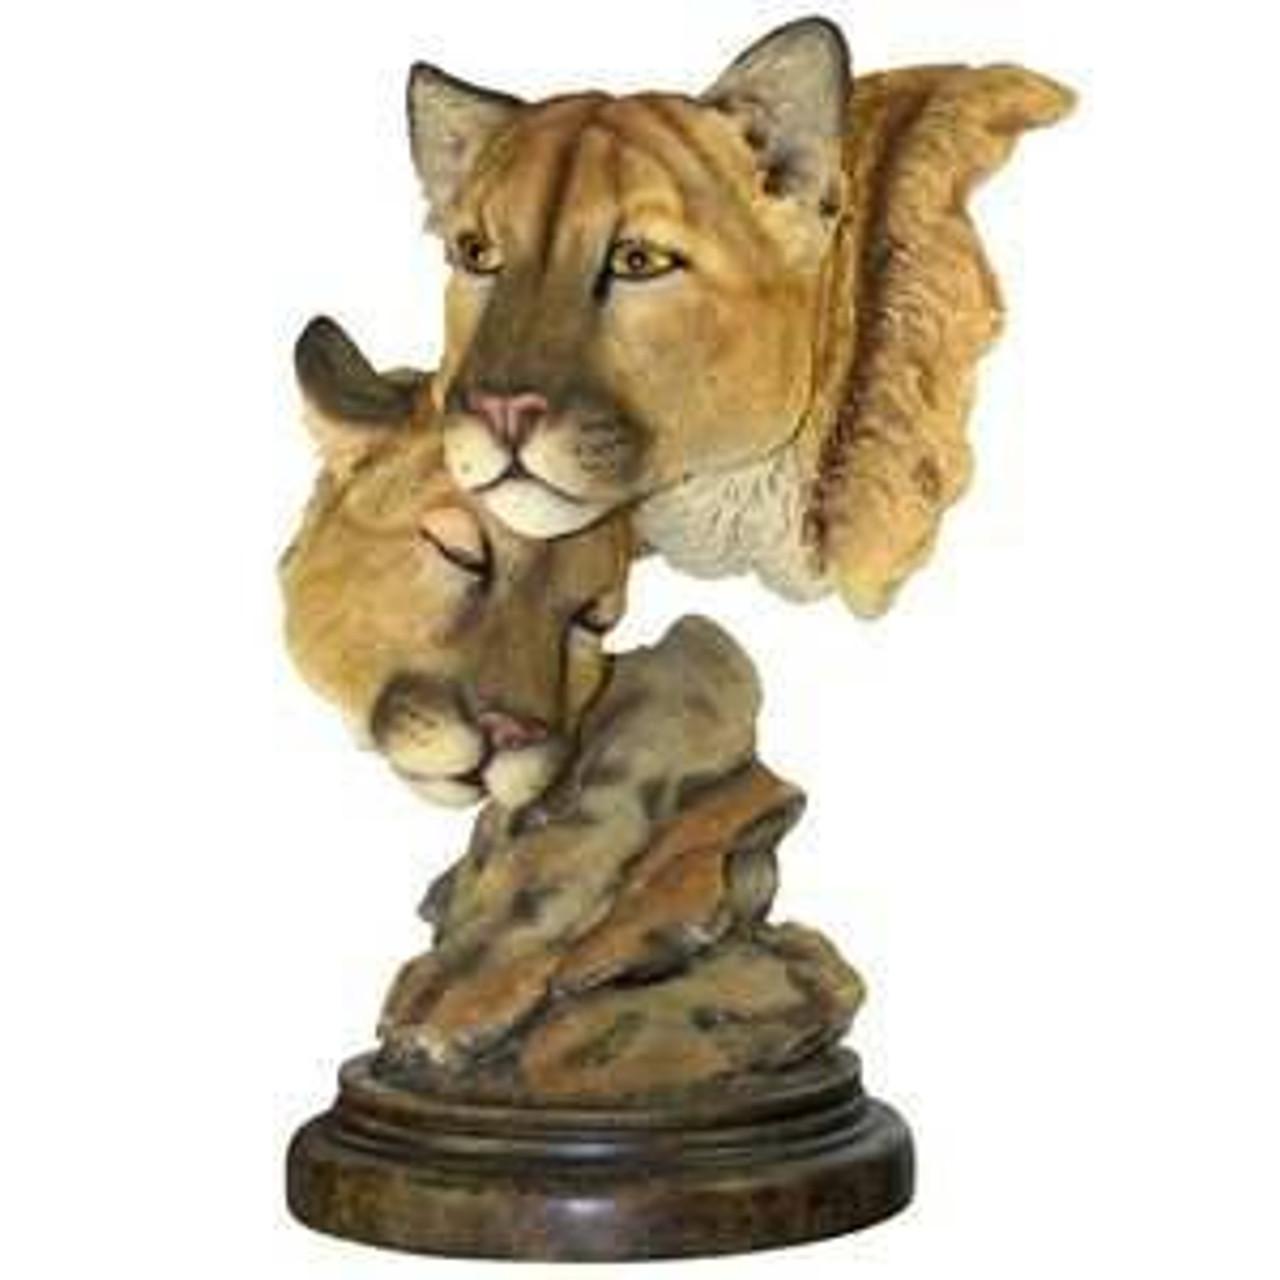 Cougar Sculptures